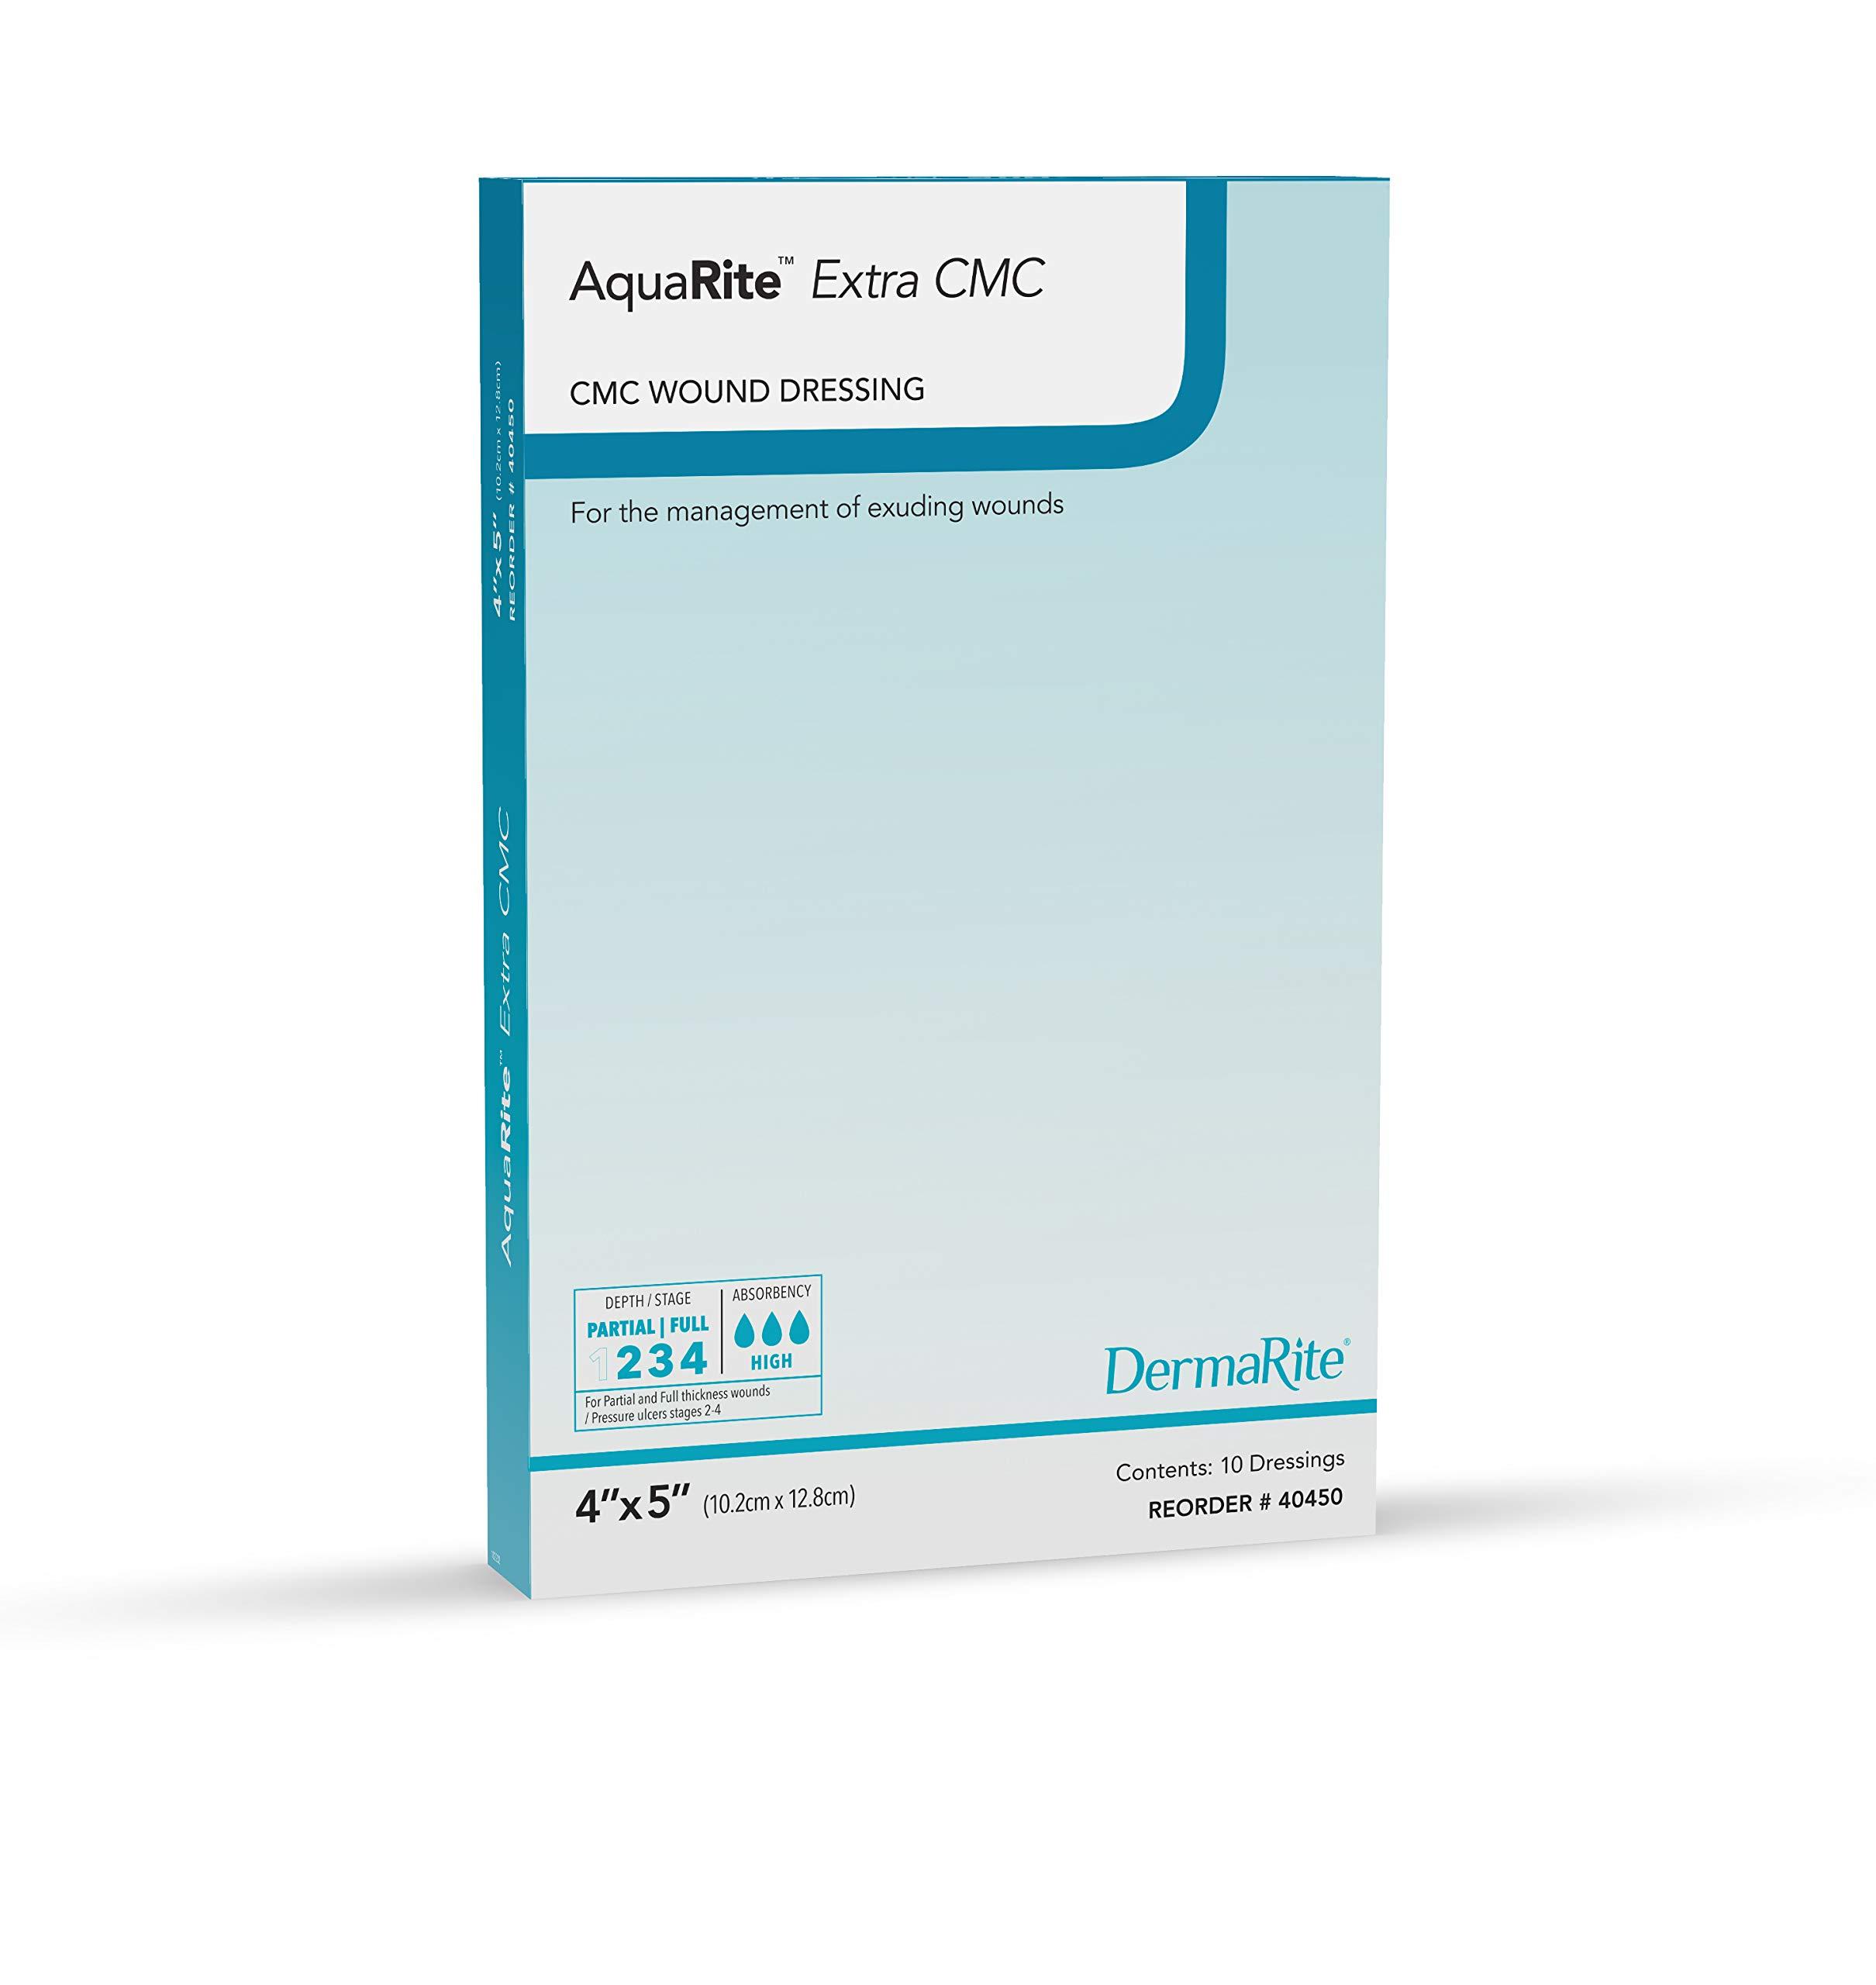 Dermarite Industries Aqua Rite Extra Cmc Hydro Fiber, 4x5, 10 Count